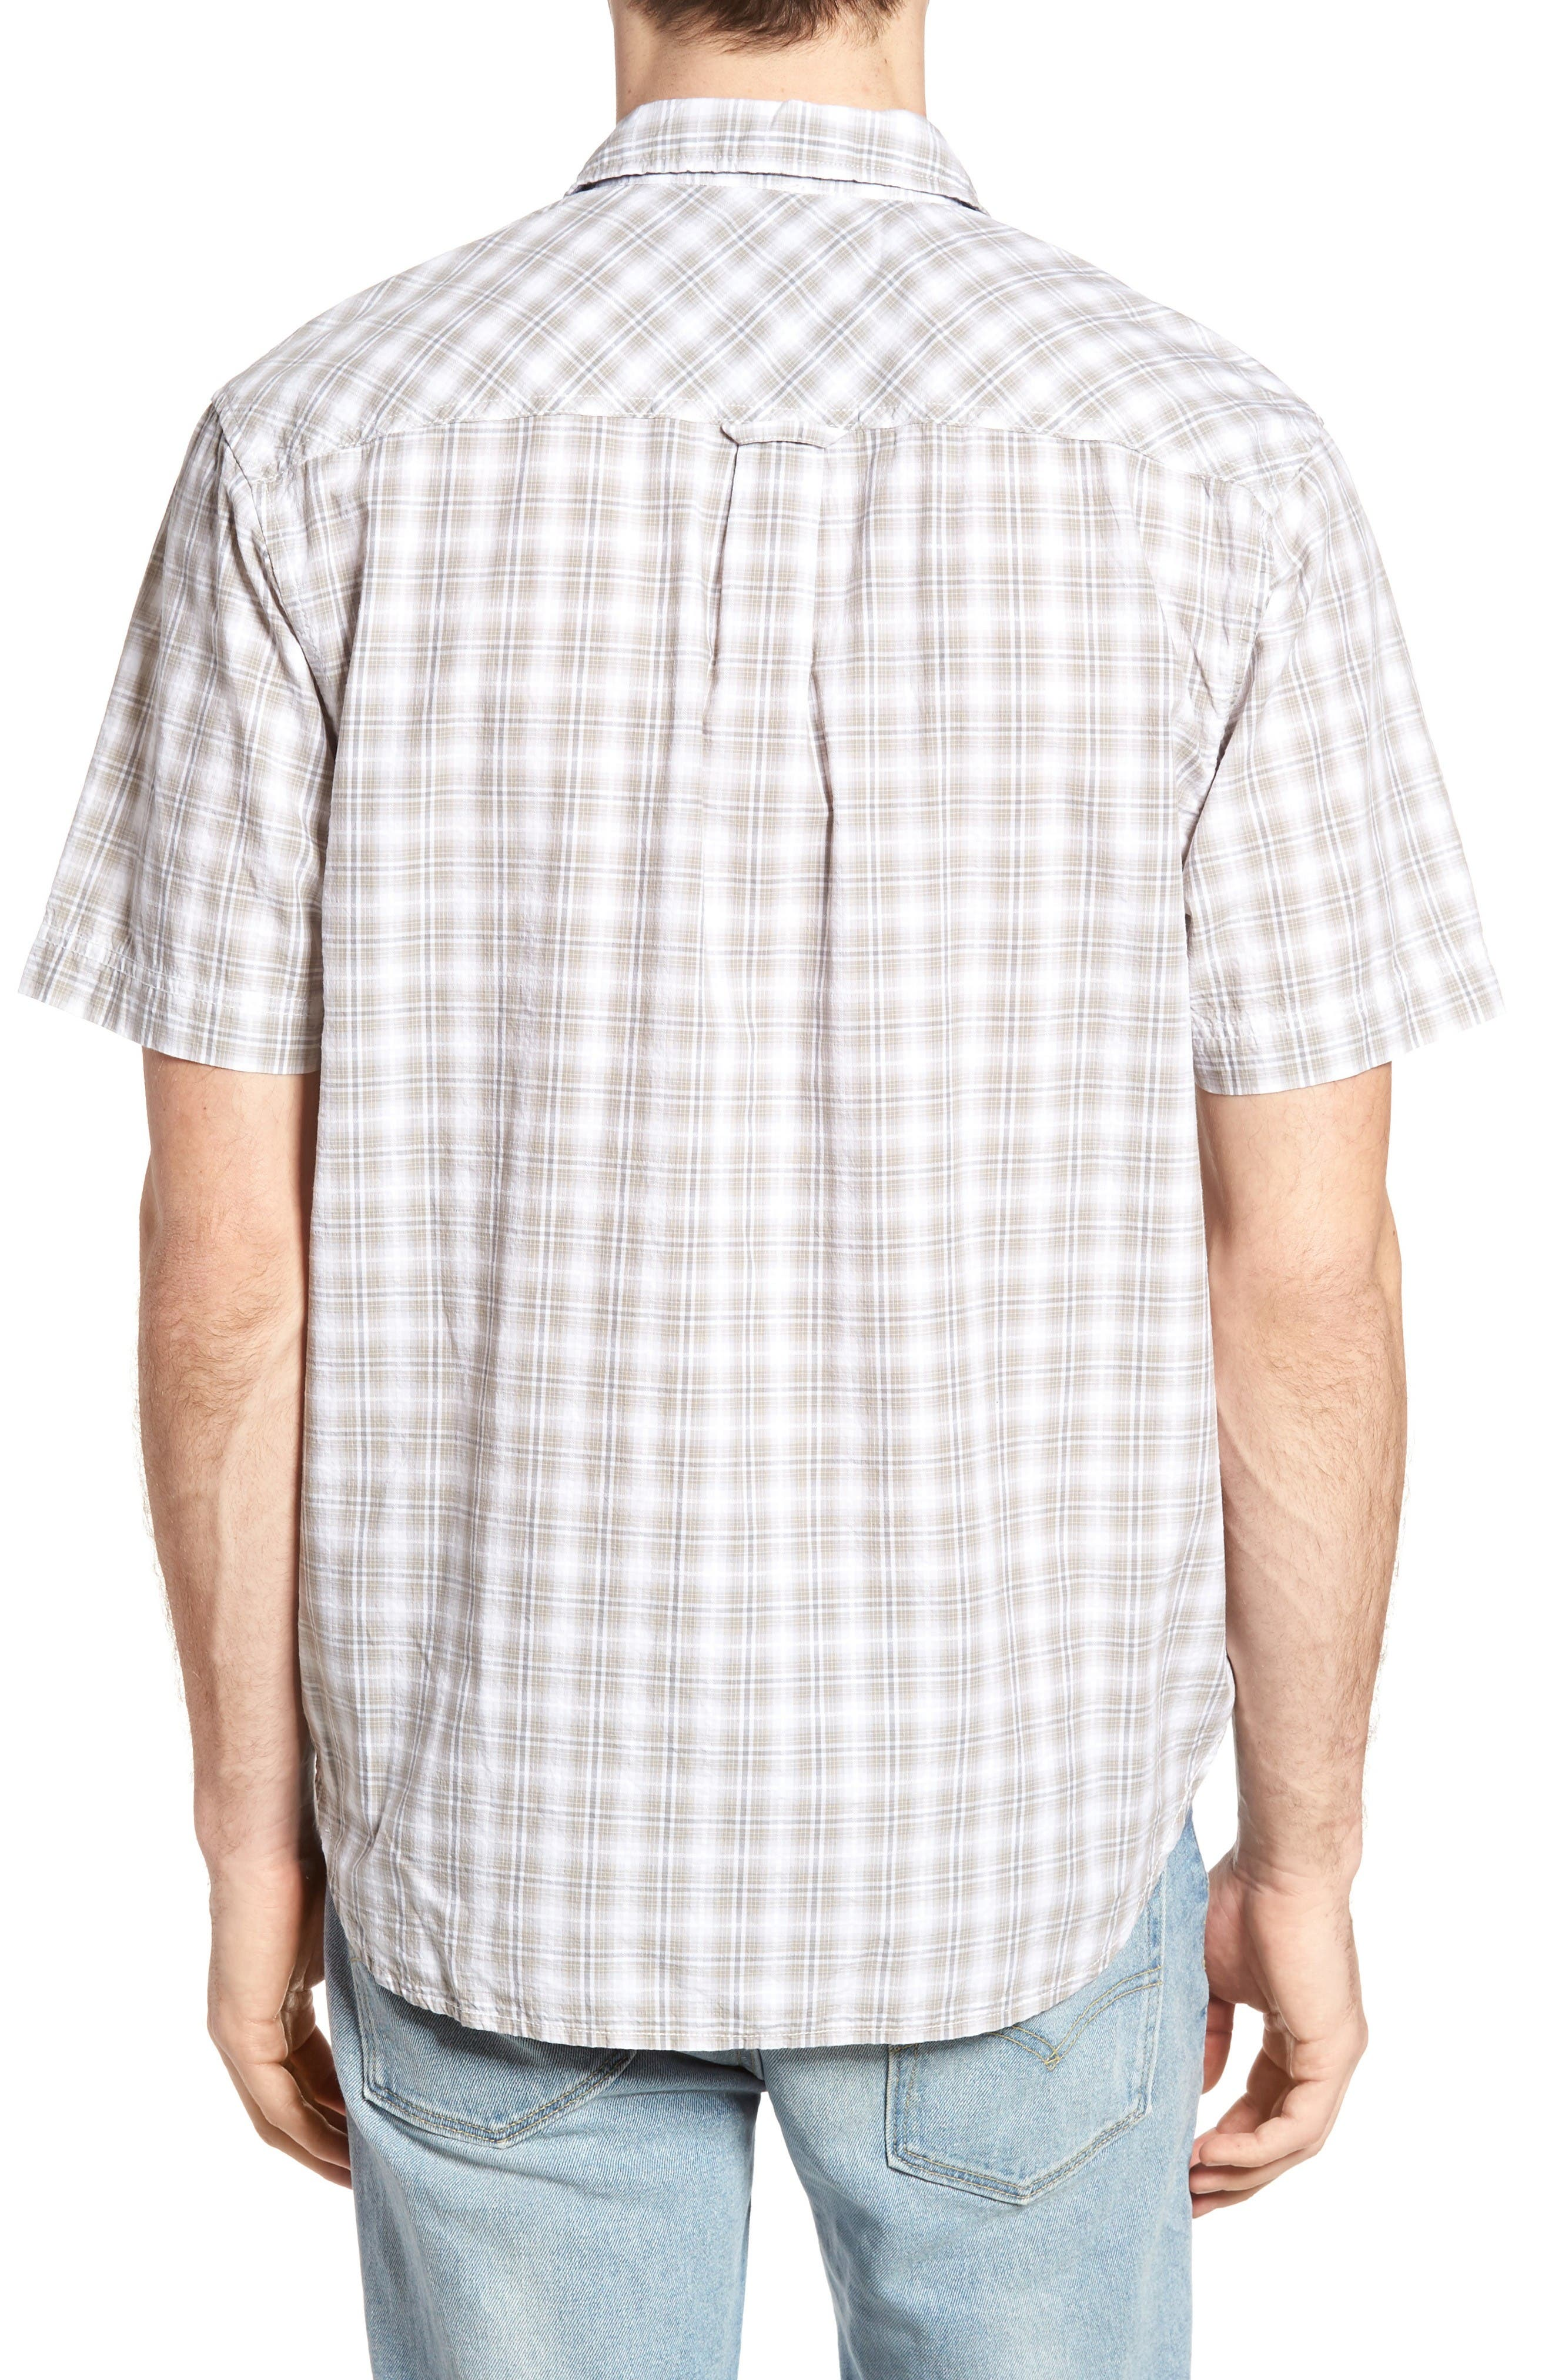 Soho Plaid Cotton Sport Shirt,                             Alternate thumbnail 2, color,                             Grey